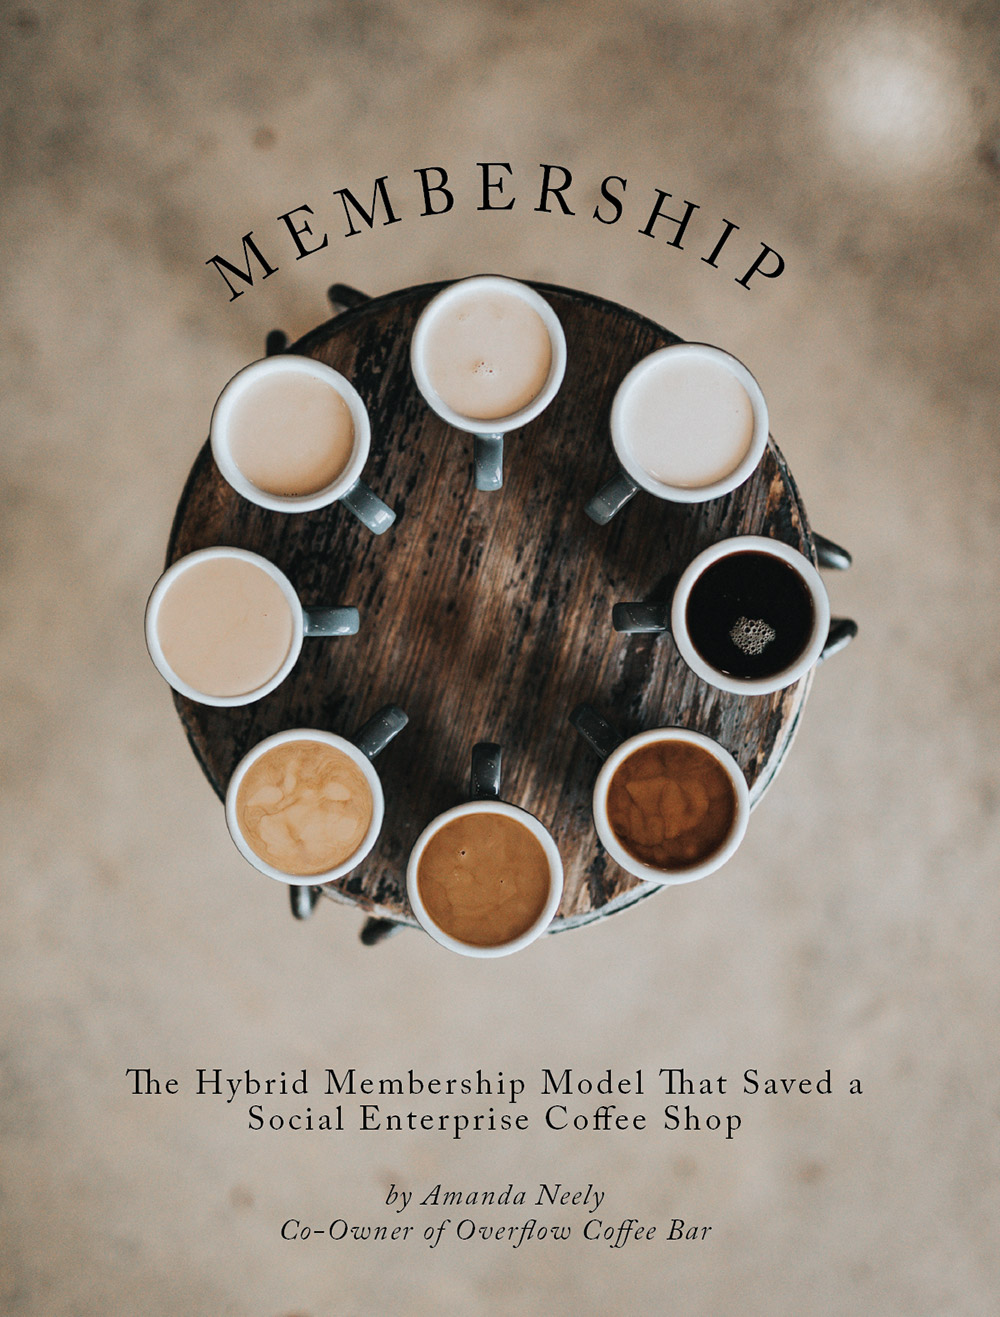 Membership Models for Social Enterprise - By Amanda Neely